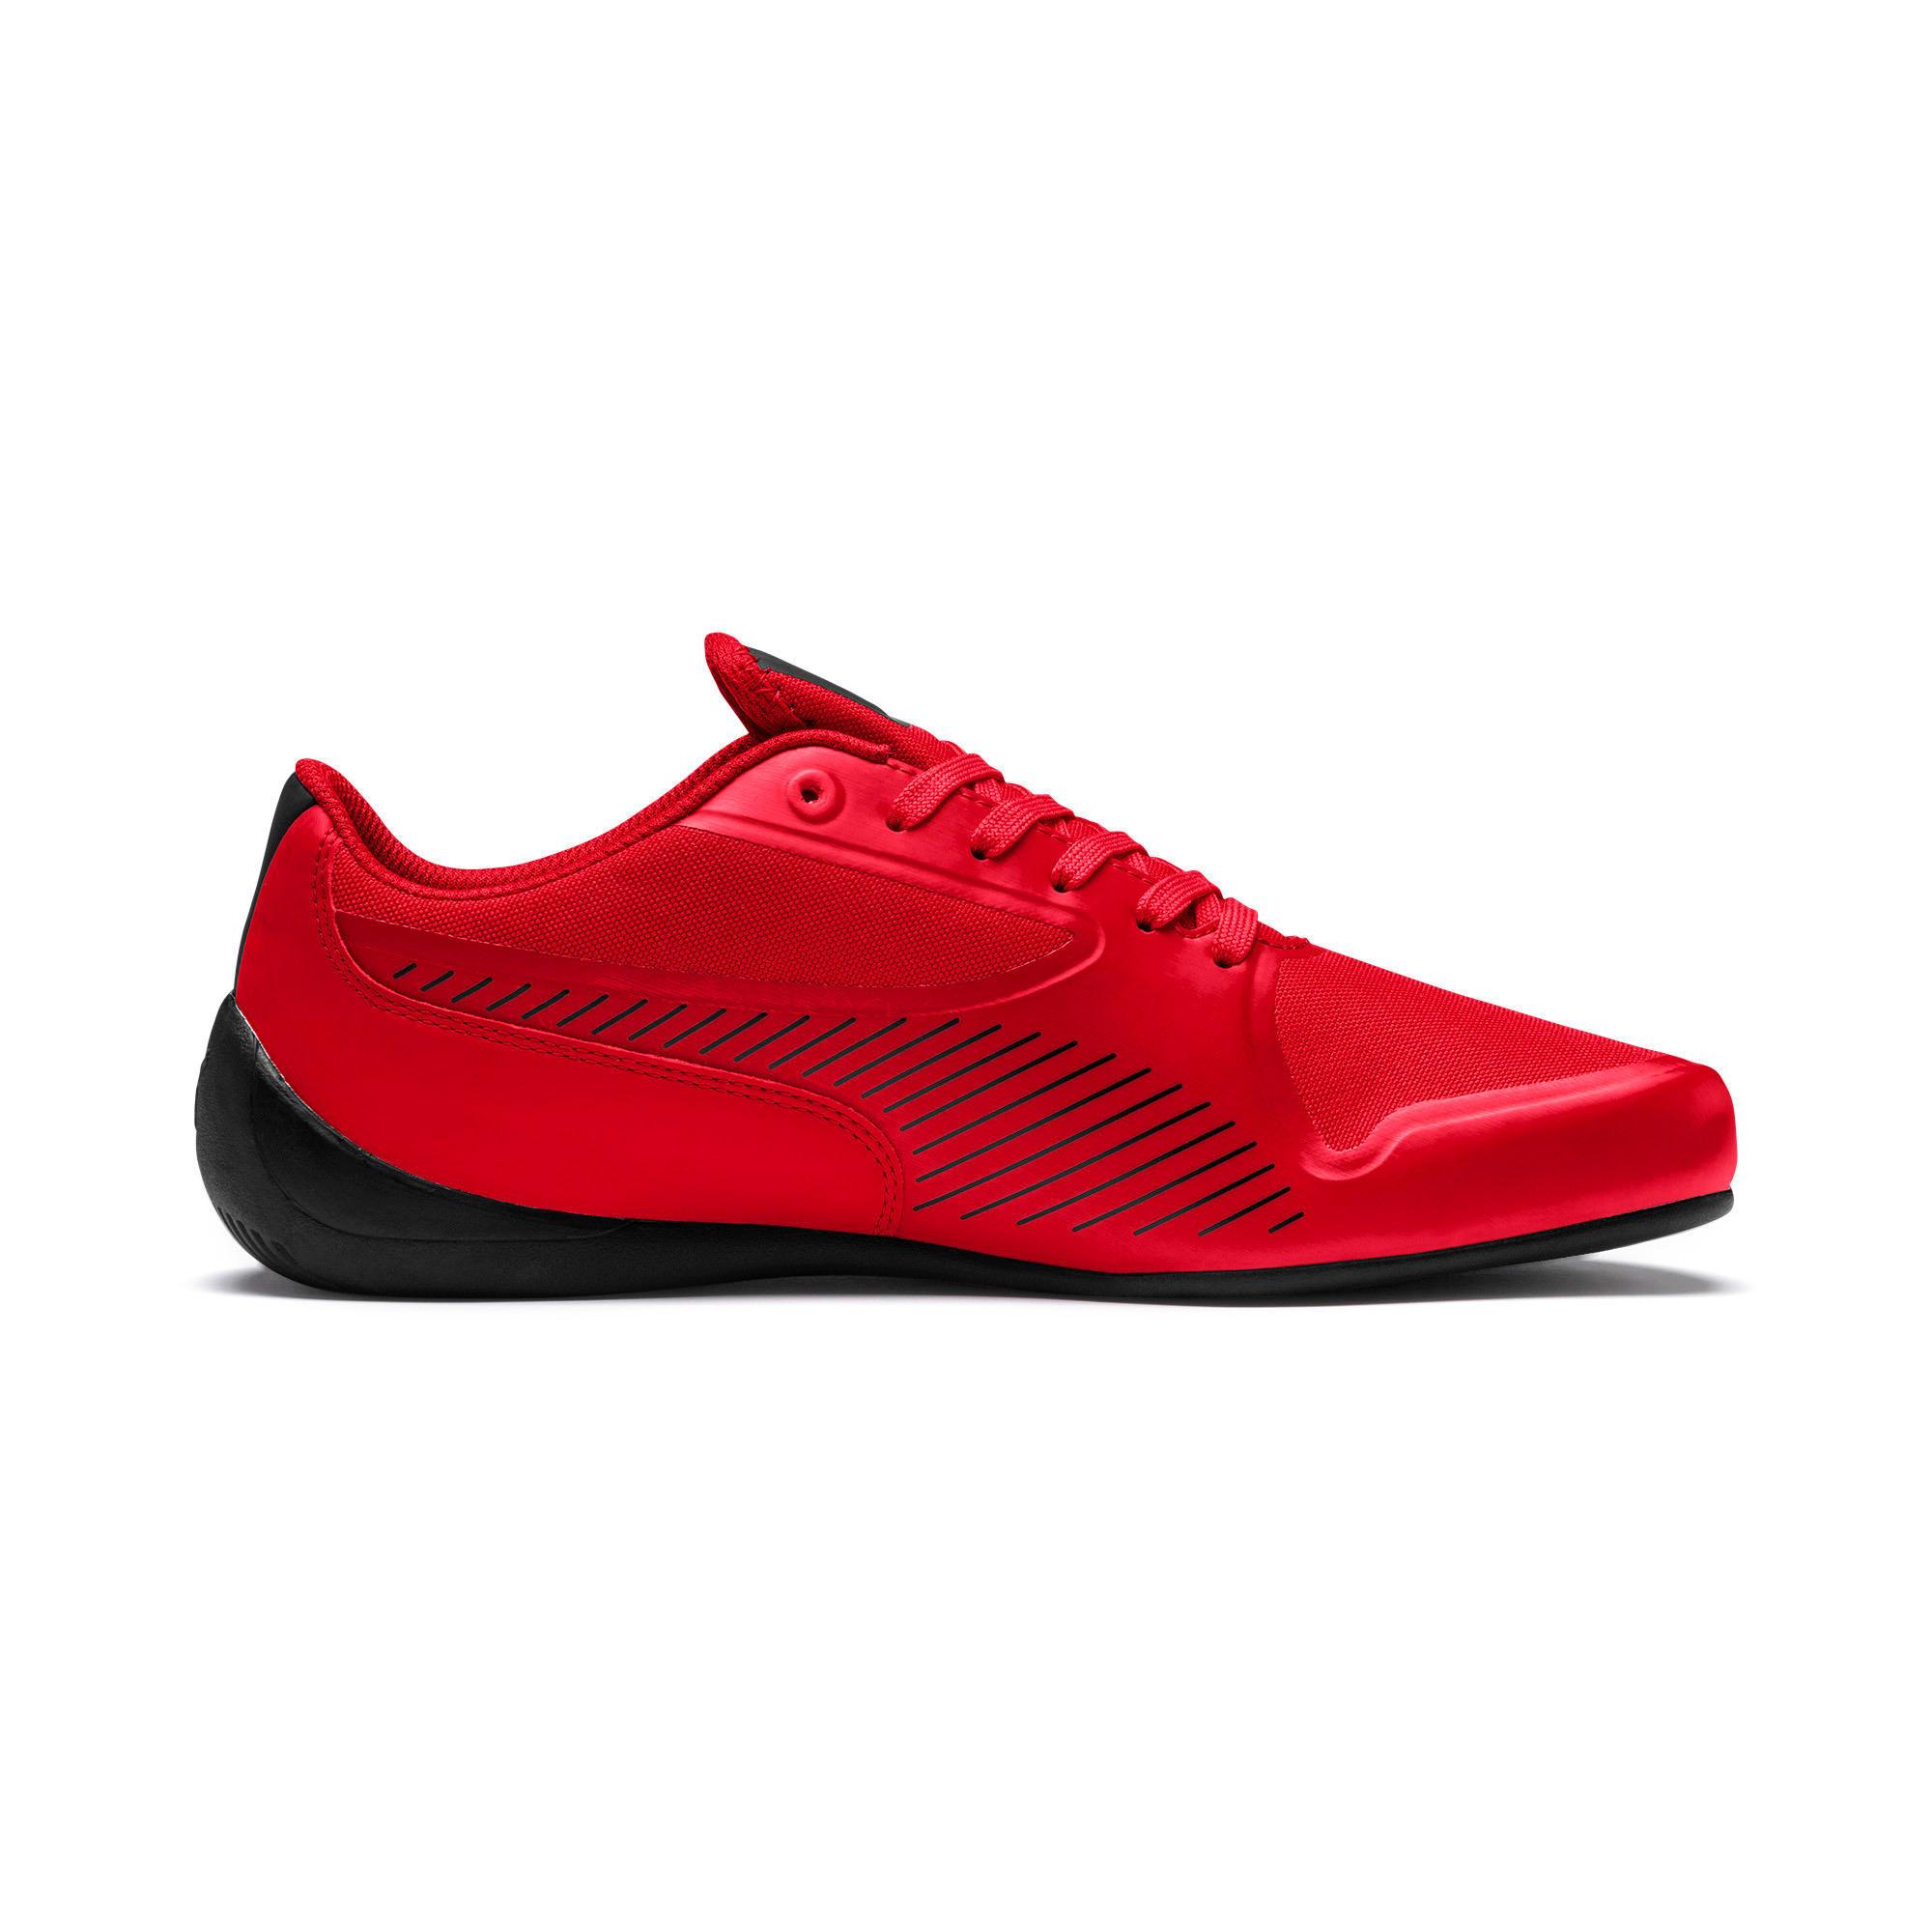 Thumbnail 5 of Scuderia Ferrari Drift Cat 7 Ultra Shoes, Rosso Corsa-Puma Black, medium